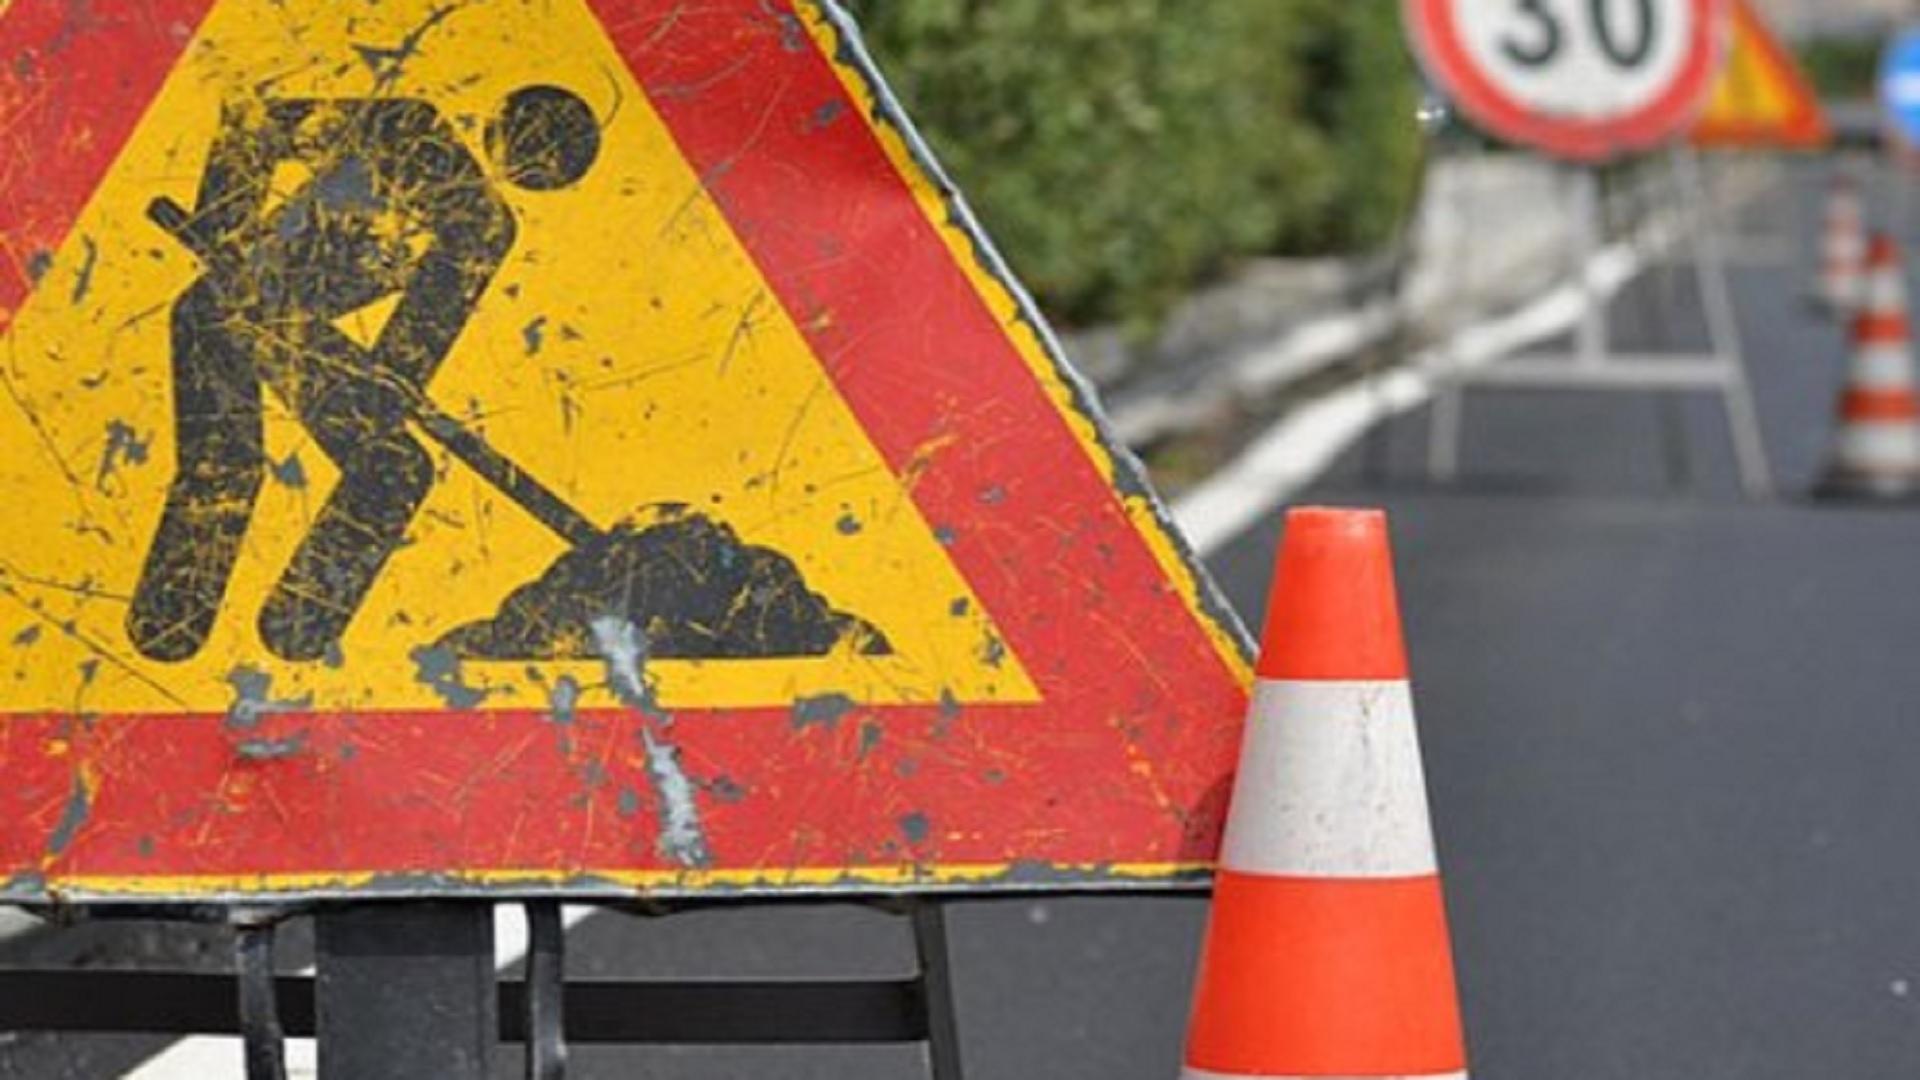 Aci Sant'Antonio manutenzione stradale